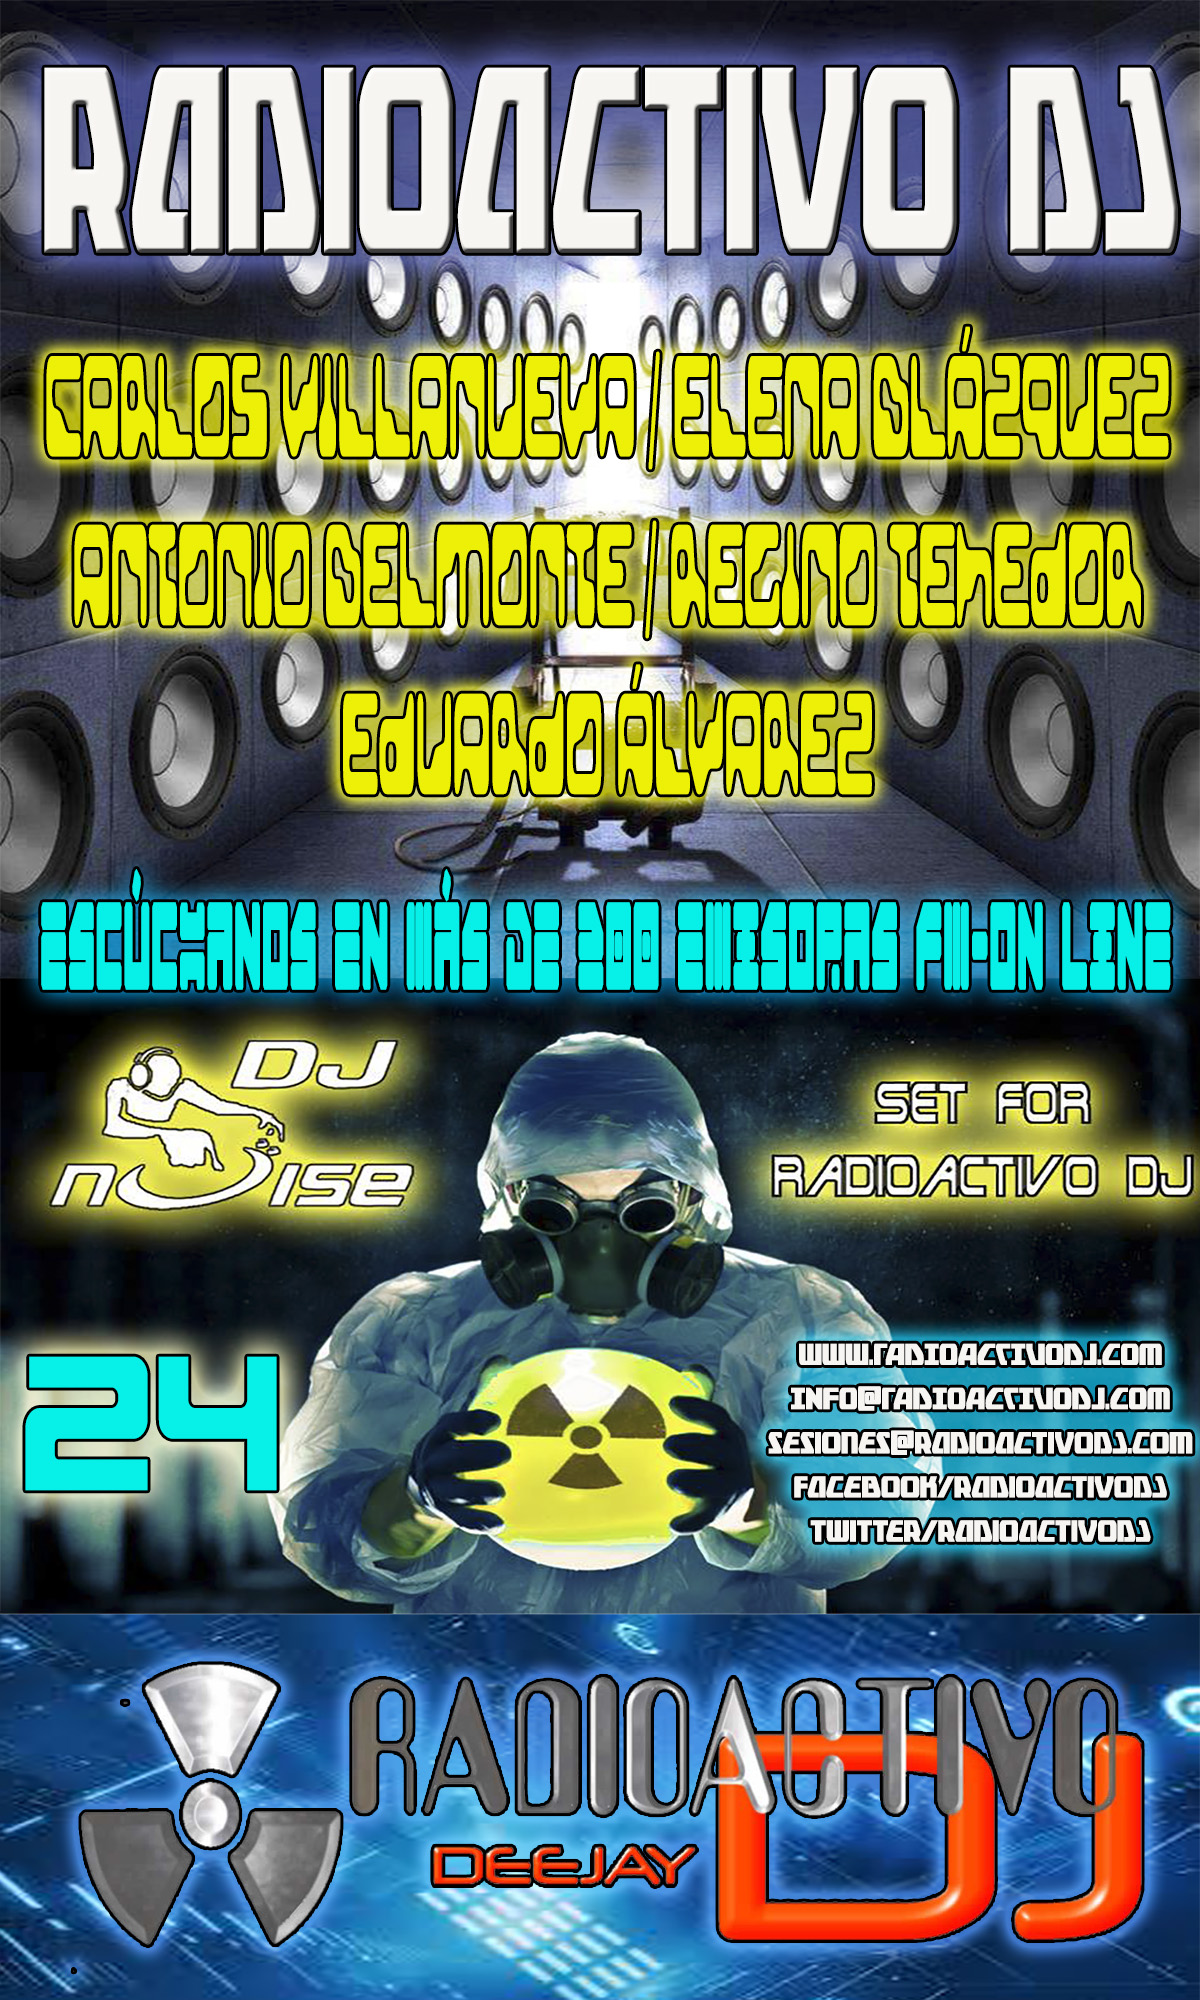 RADIOACTIVO DJ 24-2015